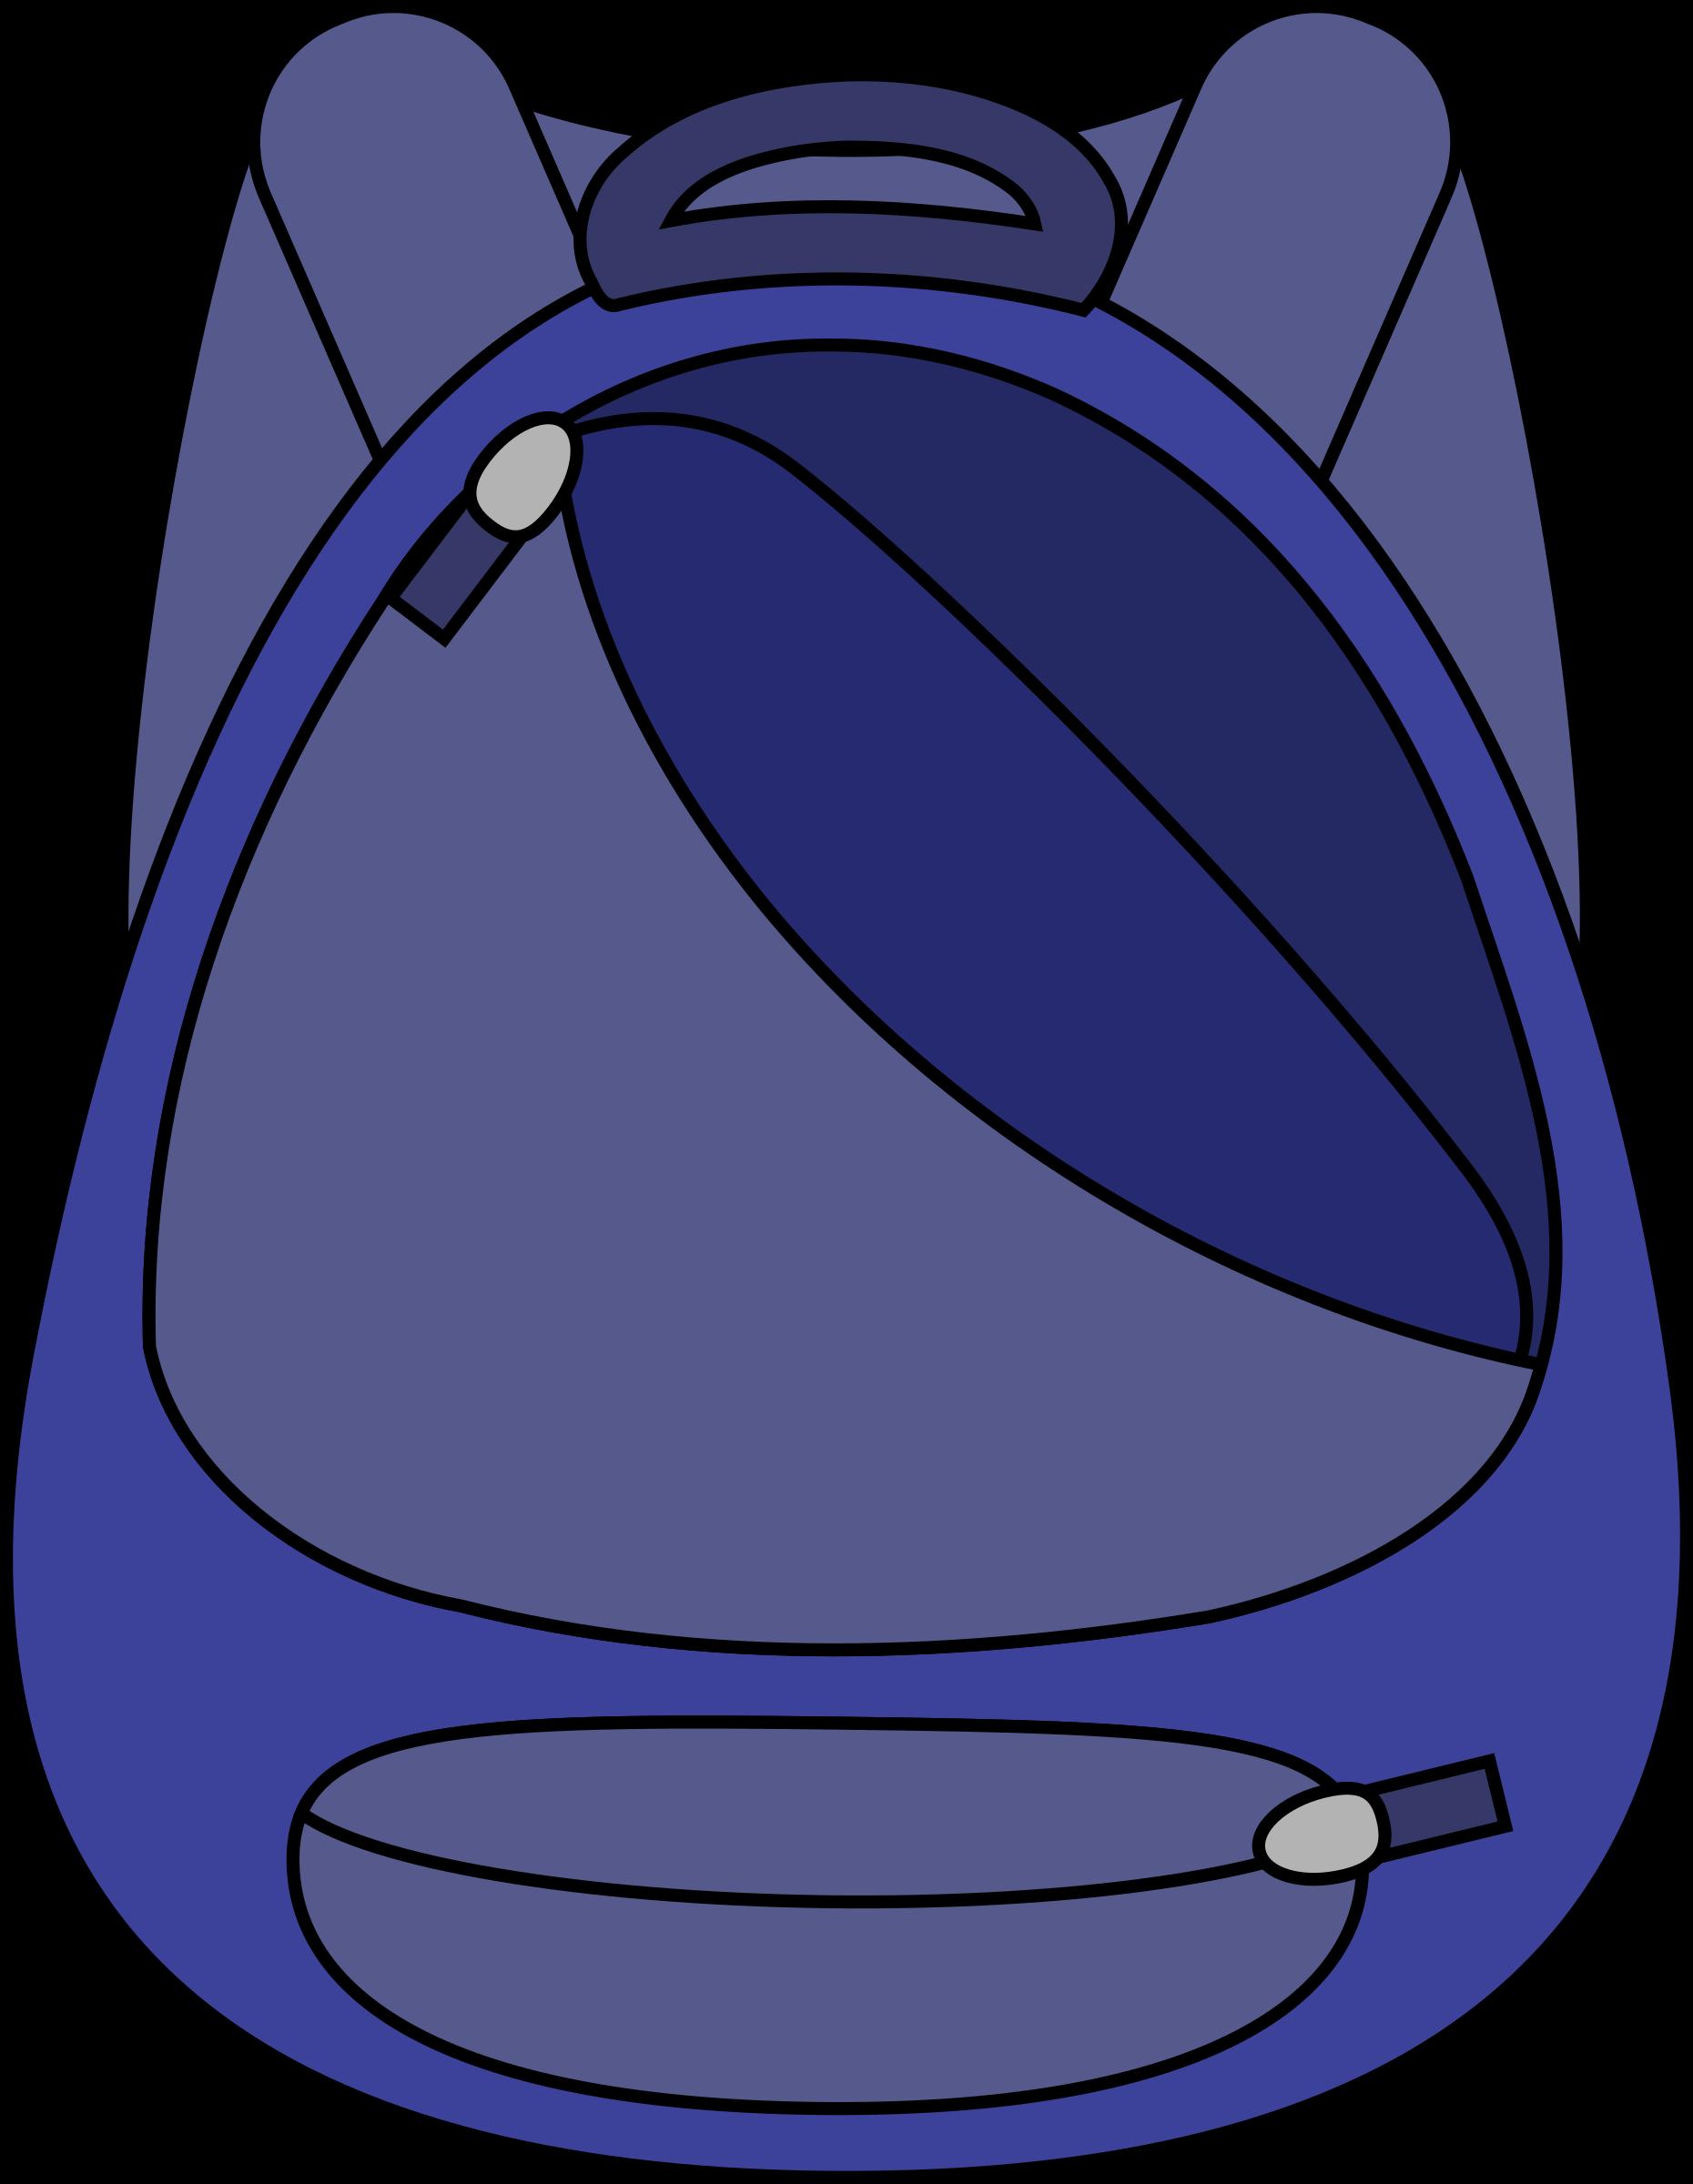 Medium Image - School Bag Clipart (1860x2400)